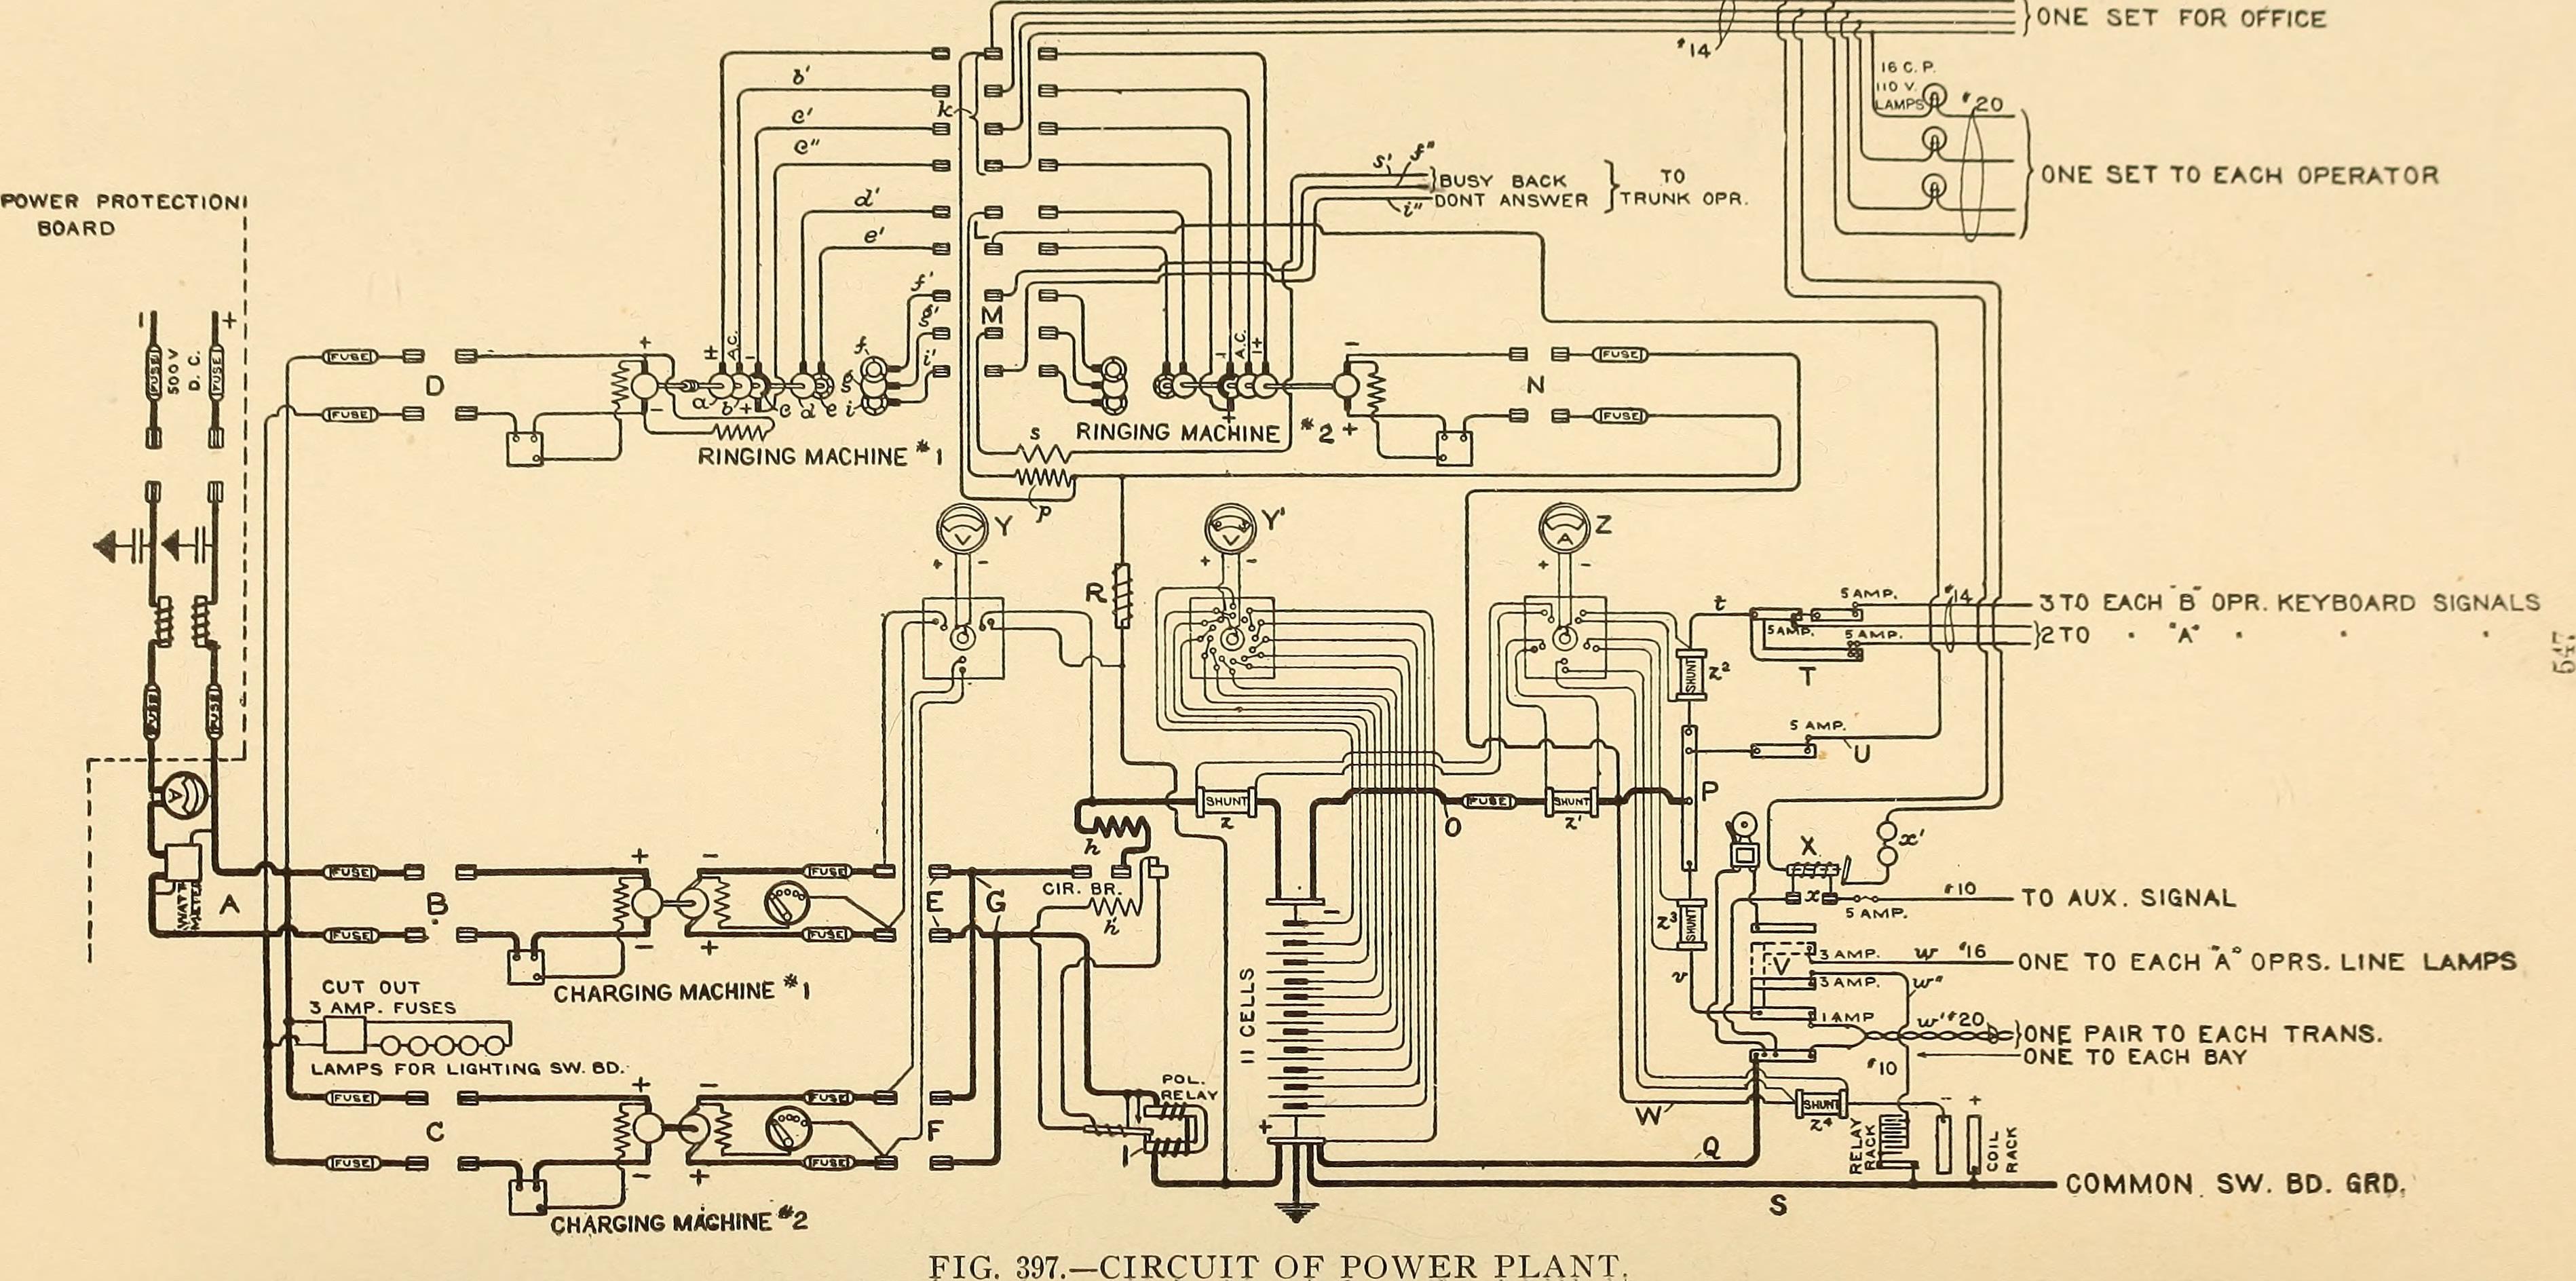 Fileamerican Telephone Practice 1905 14569916817 Circuit Diagram